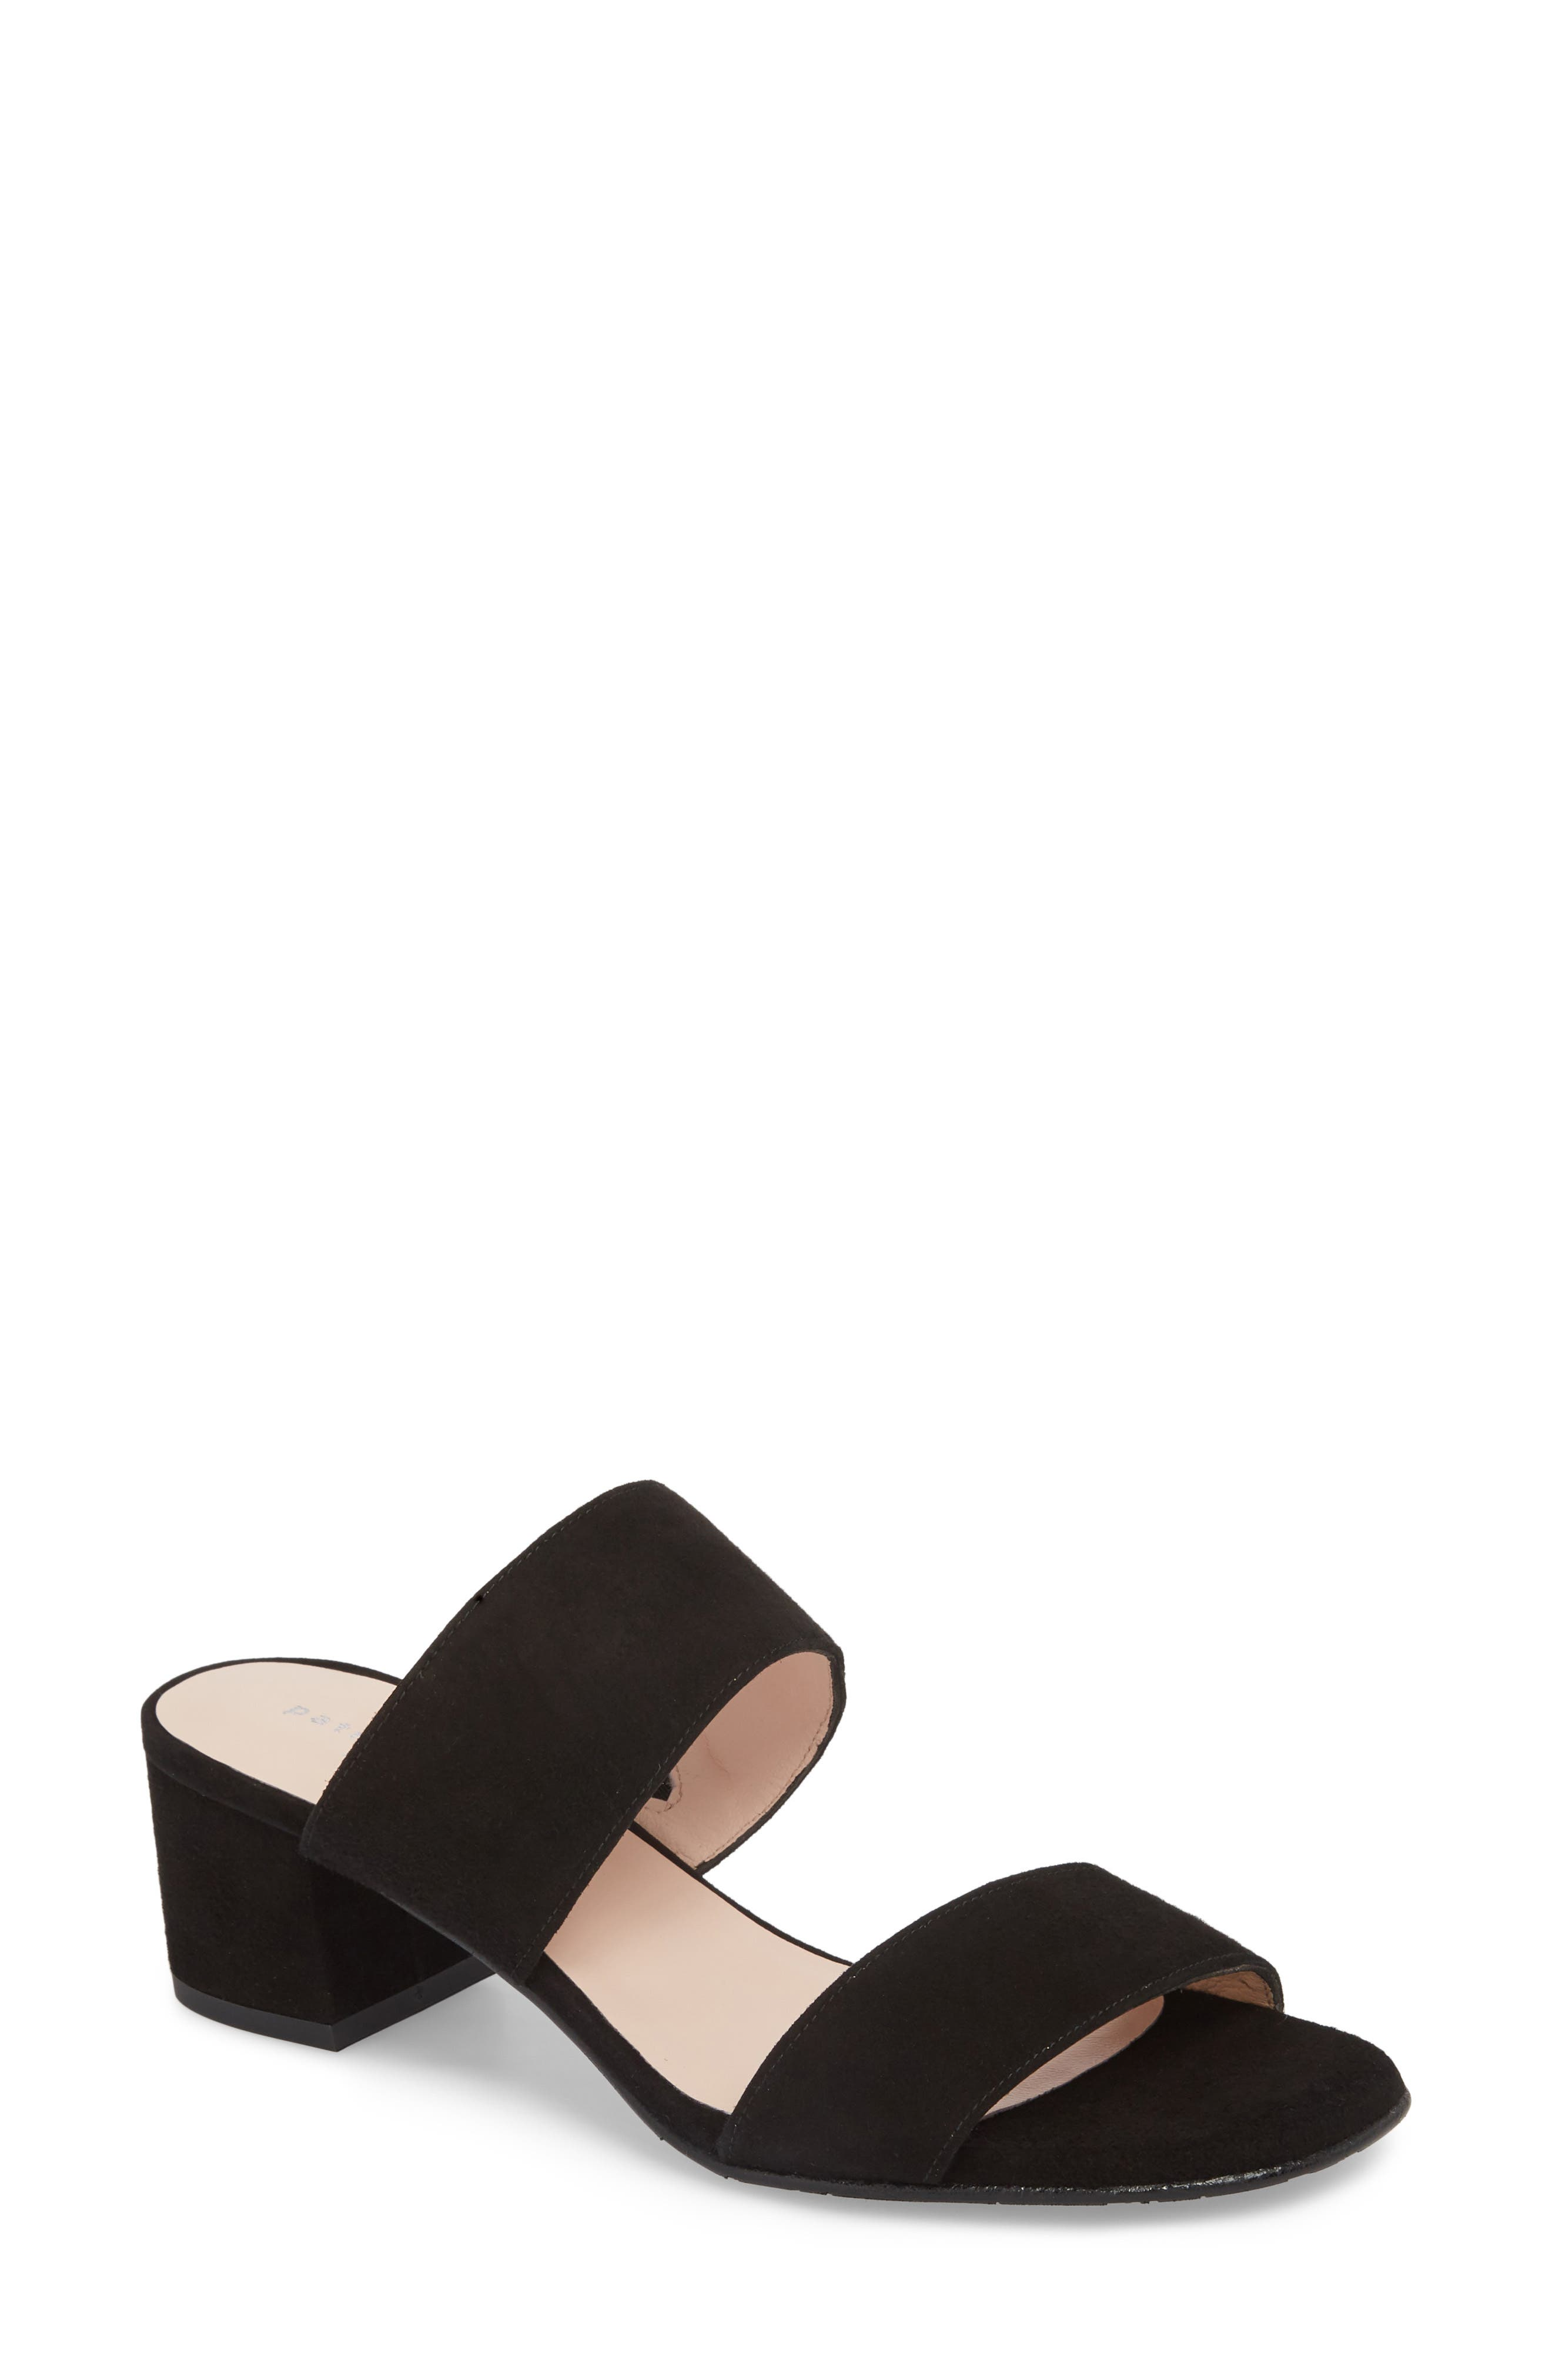 Lola Slide Sandal,                             Main thumbnail 1, color,                             BLACK SUEDE